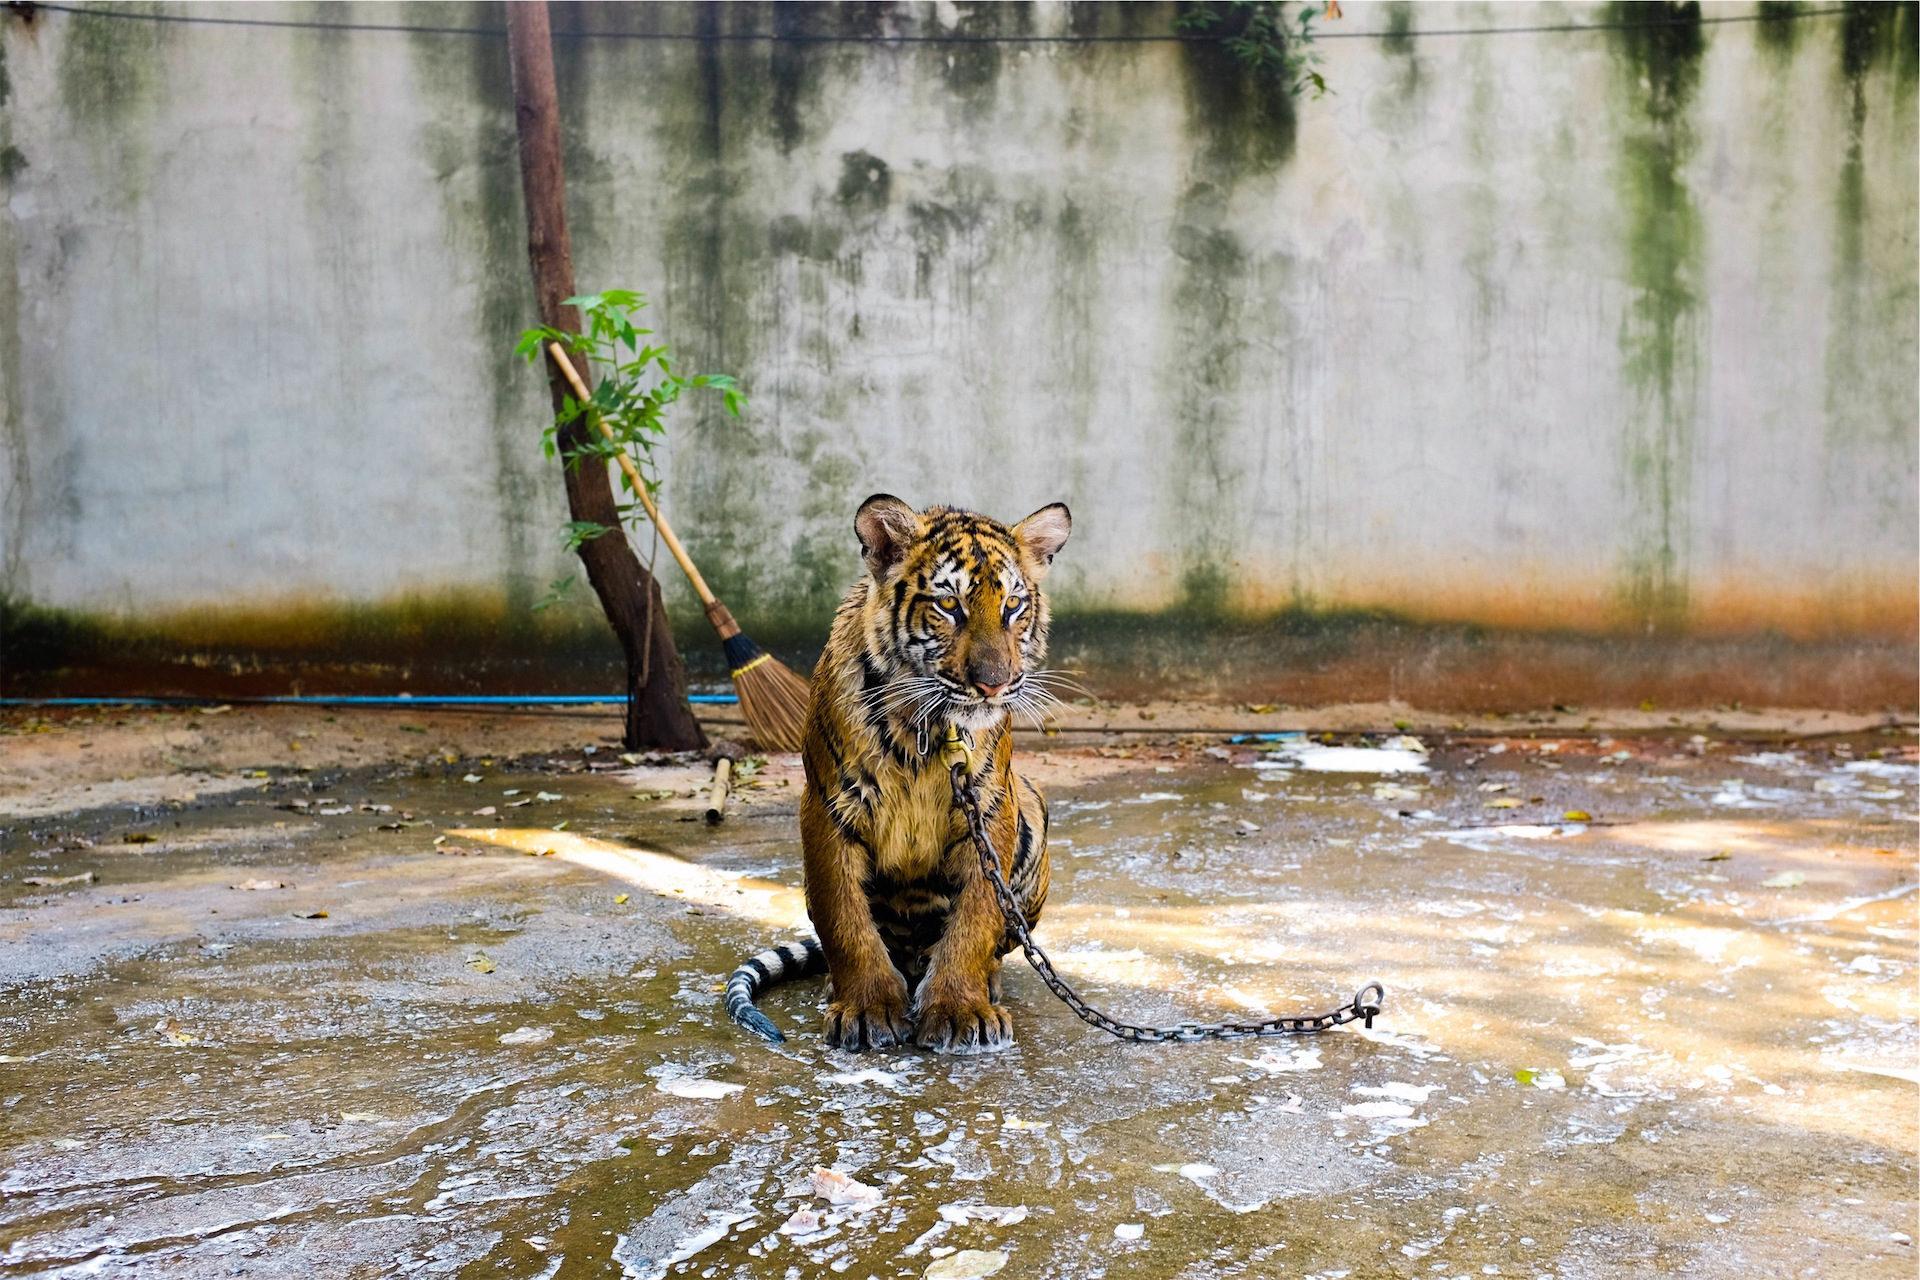 टाइगर, cautividad, zoológico, चेन, देखो - HD वॉलपेपर - प्रोफेसर-falken.com